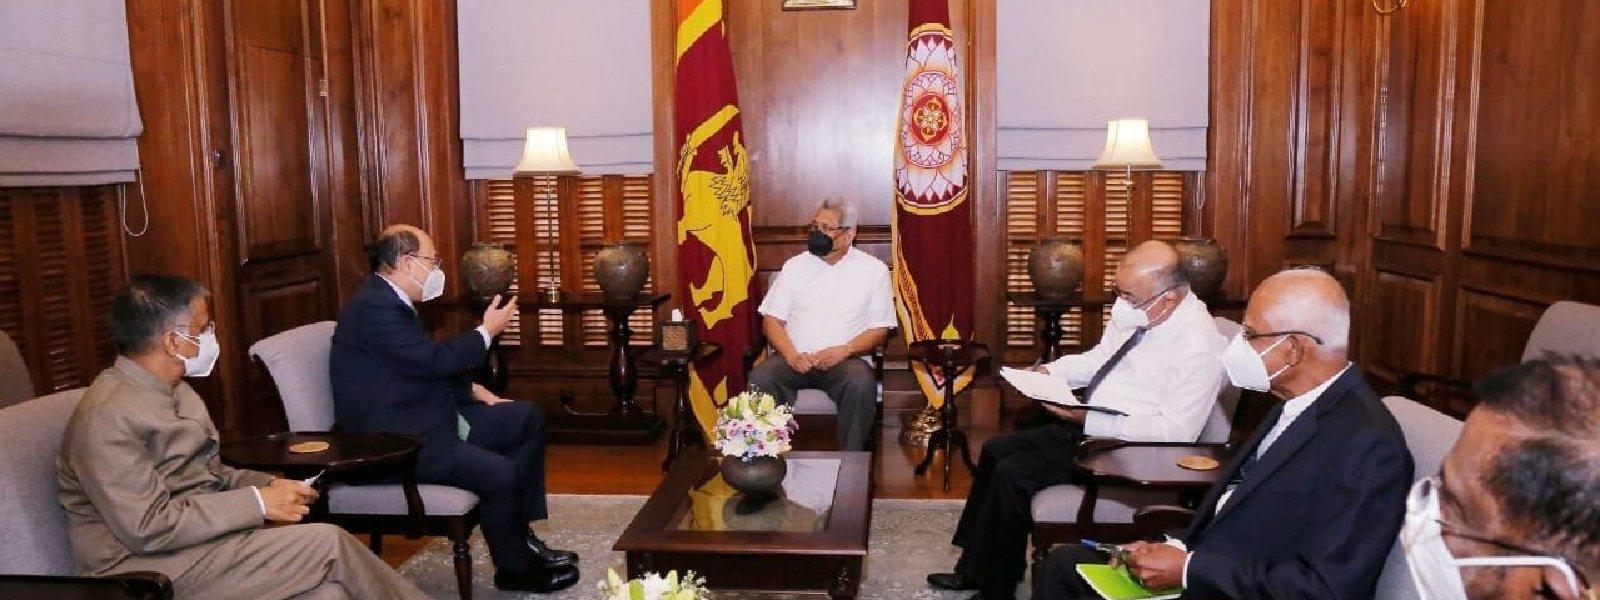 Indian Foreign Secretary meets President Rajapaksa